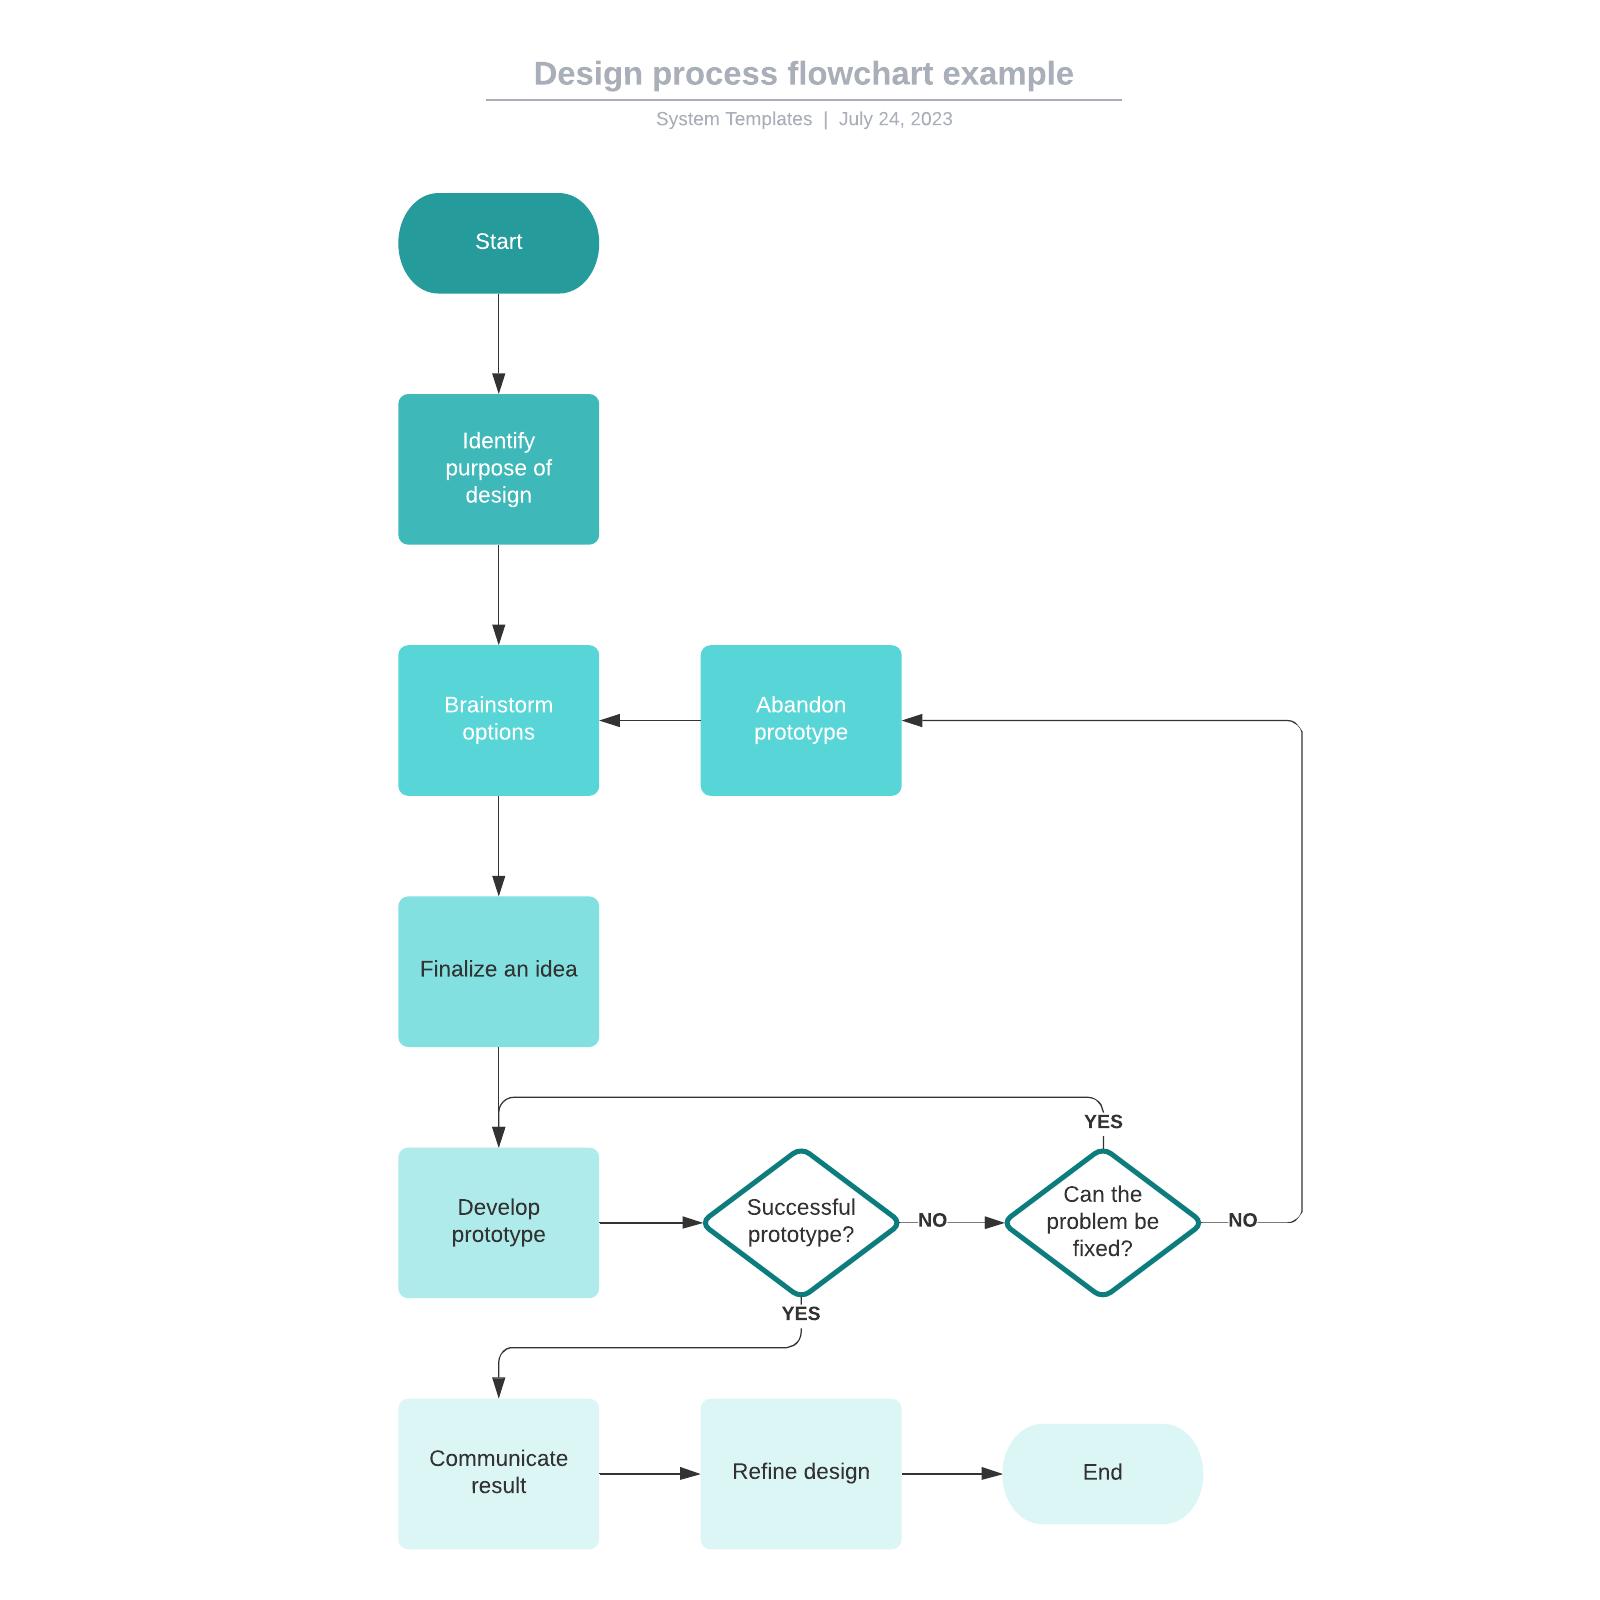 Design process flowchart example